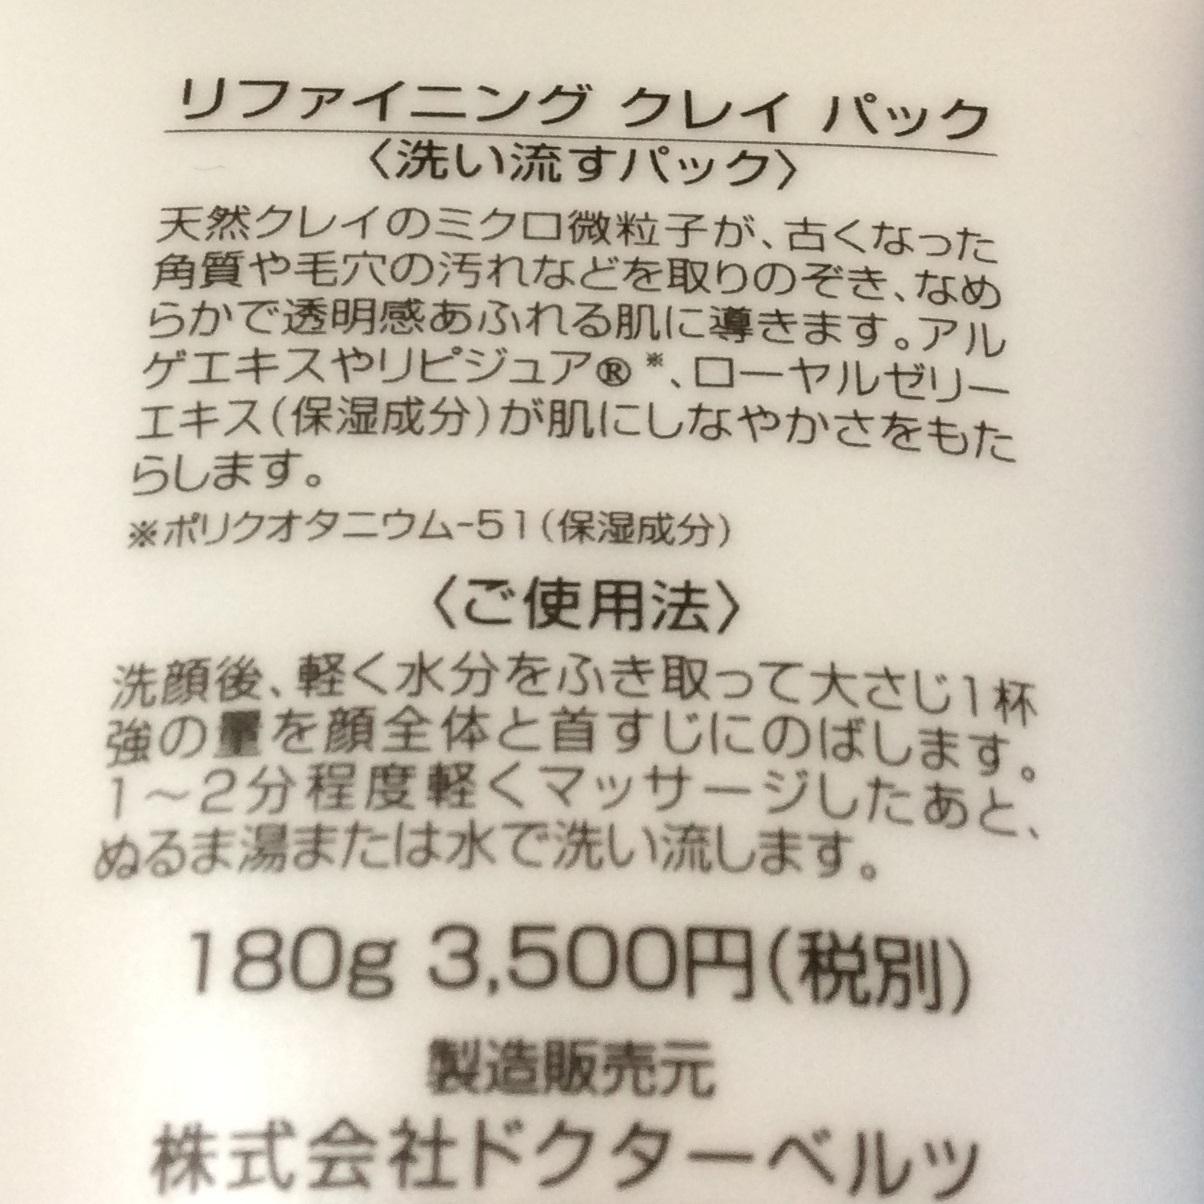 4D213AEC-4CE4-4461-8A5F-6E9A9795C46B.jpeg